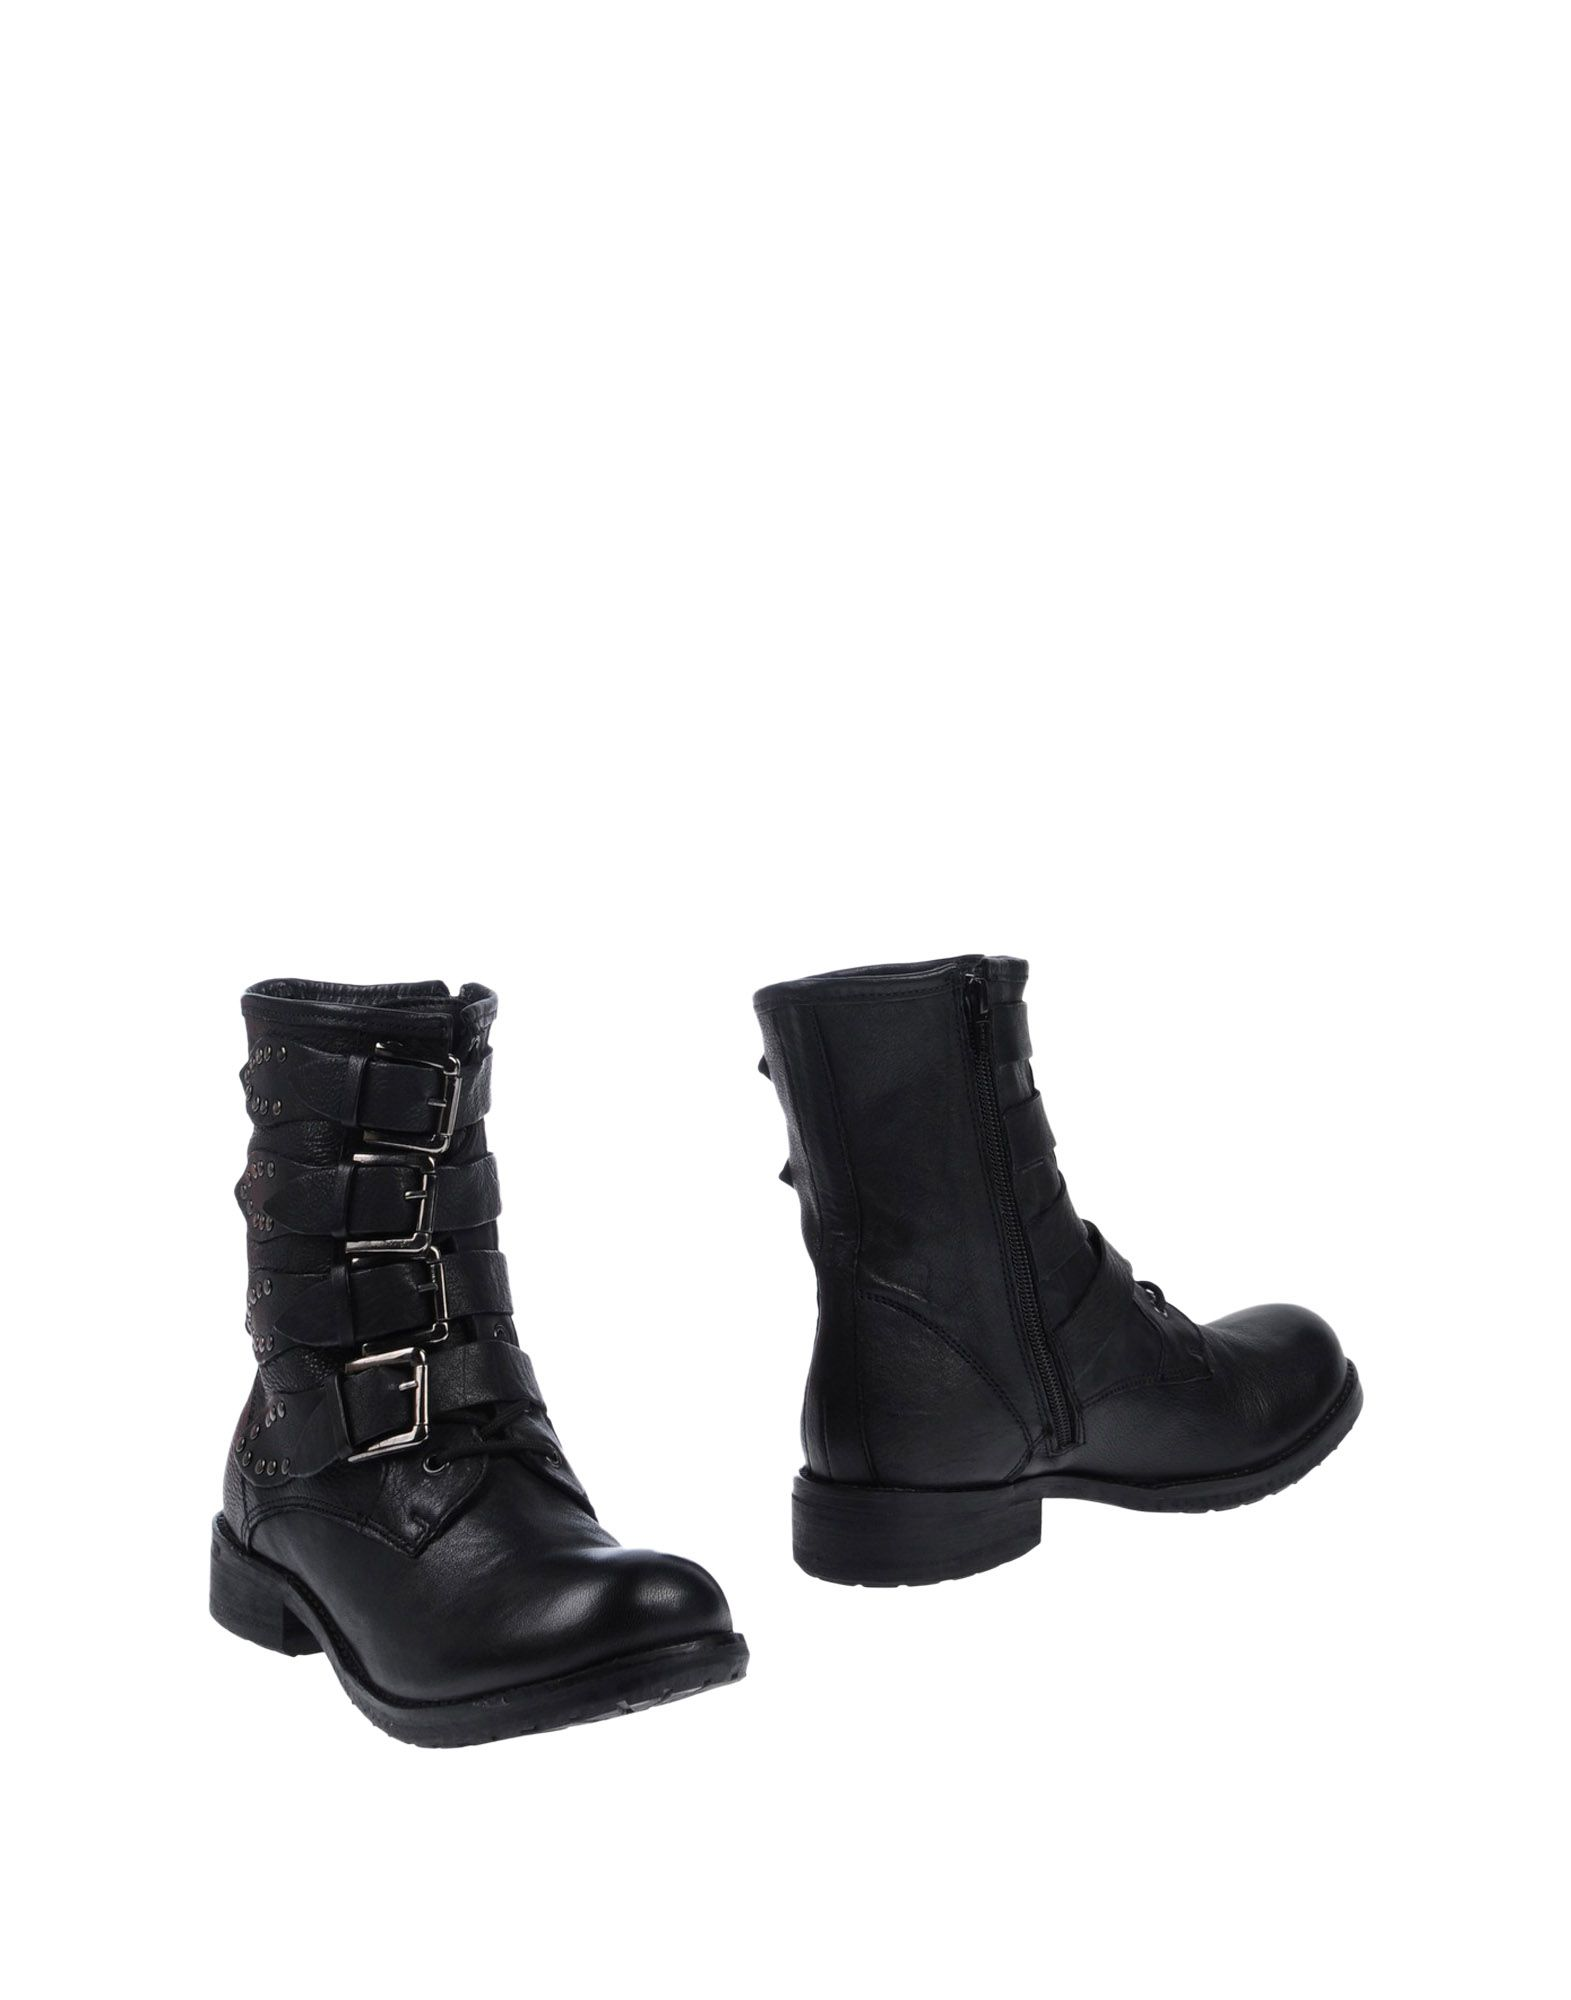 Haltbare Mode billige Schuhe E.G.J. Stiefelette Damen 11506343RD  11506343RD Damen Heiße Schuhe 3c3420